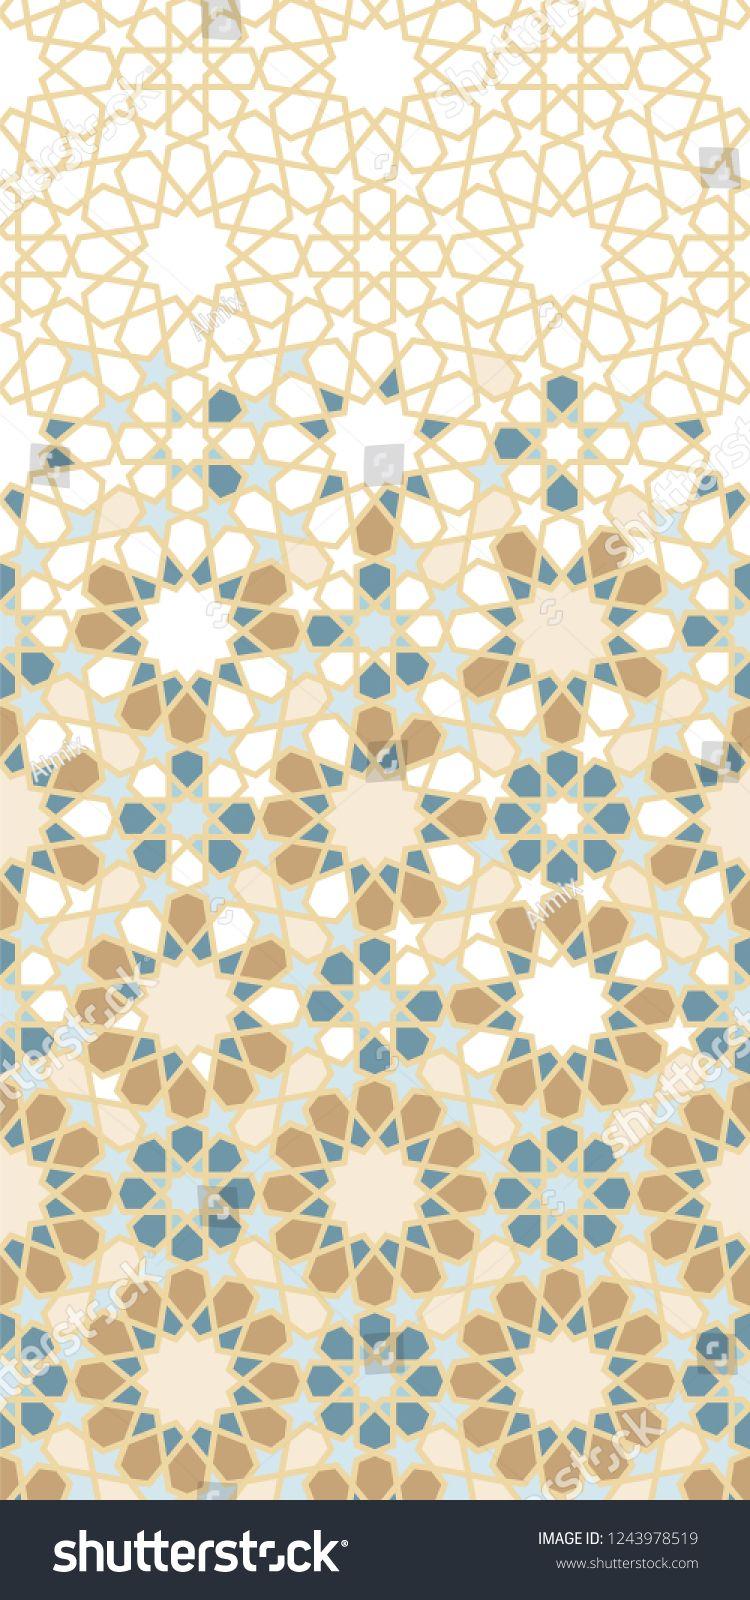 Arabic Pattern Arabesque Repeating Vector Border Geometric Halftone Texture With Color Tile Disintegration Or Breaking Arabesque A Ide Dekorasi Ide Lebaran